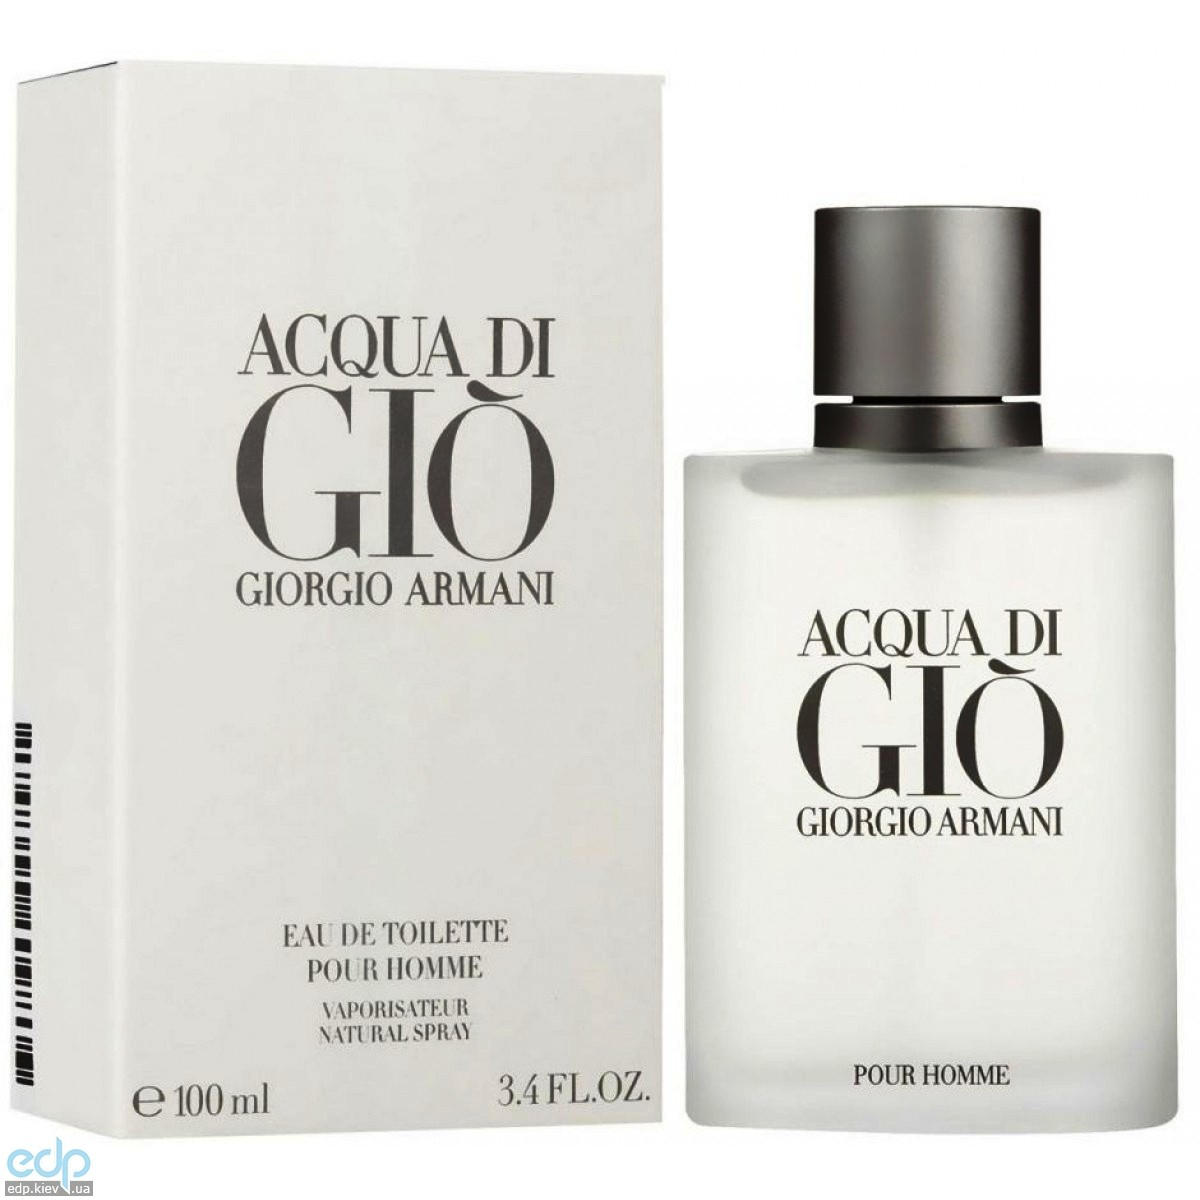 Giorgio Armani Acqua di Gio pour homme - туалетная вода - 50 ml TESTER